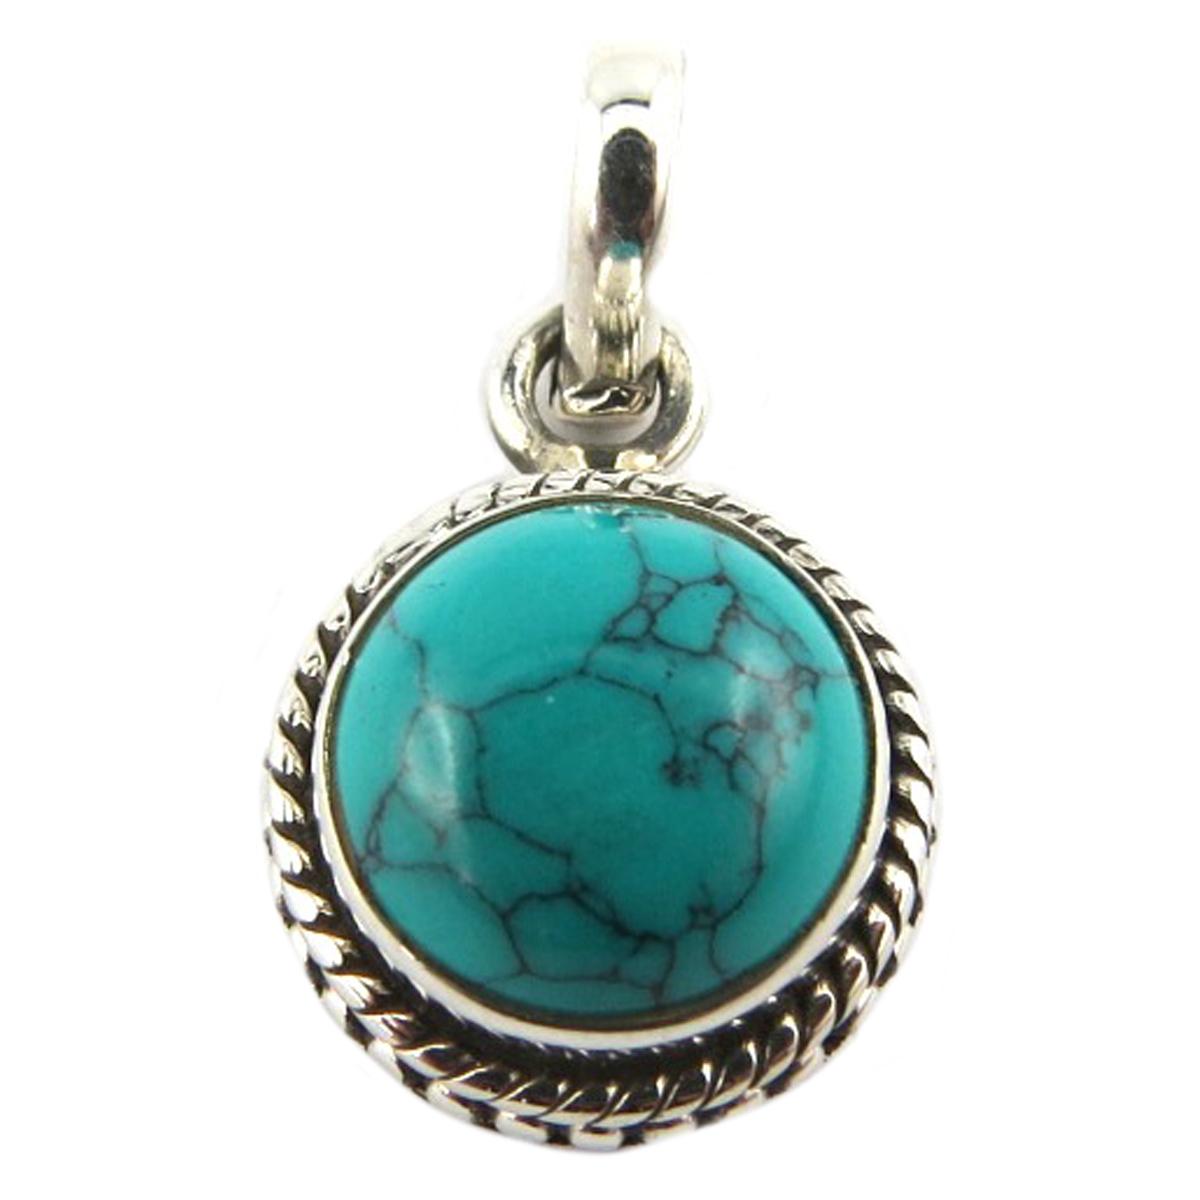 Pendentif Argent artisanal \'Heaven\' turquoise - 12 mm - [Q9867]